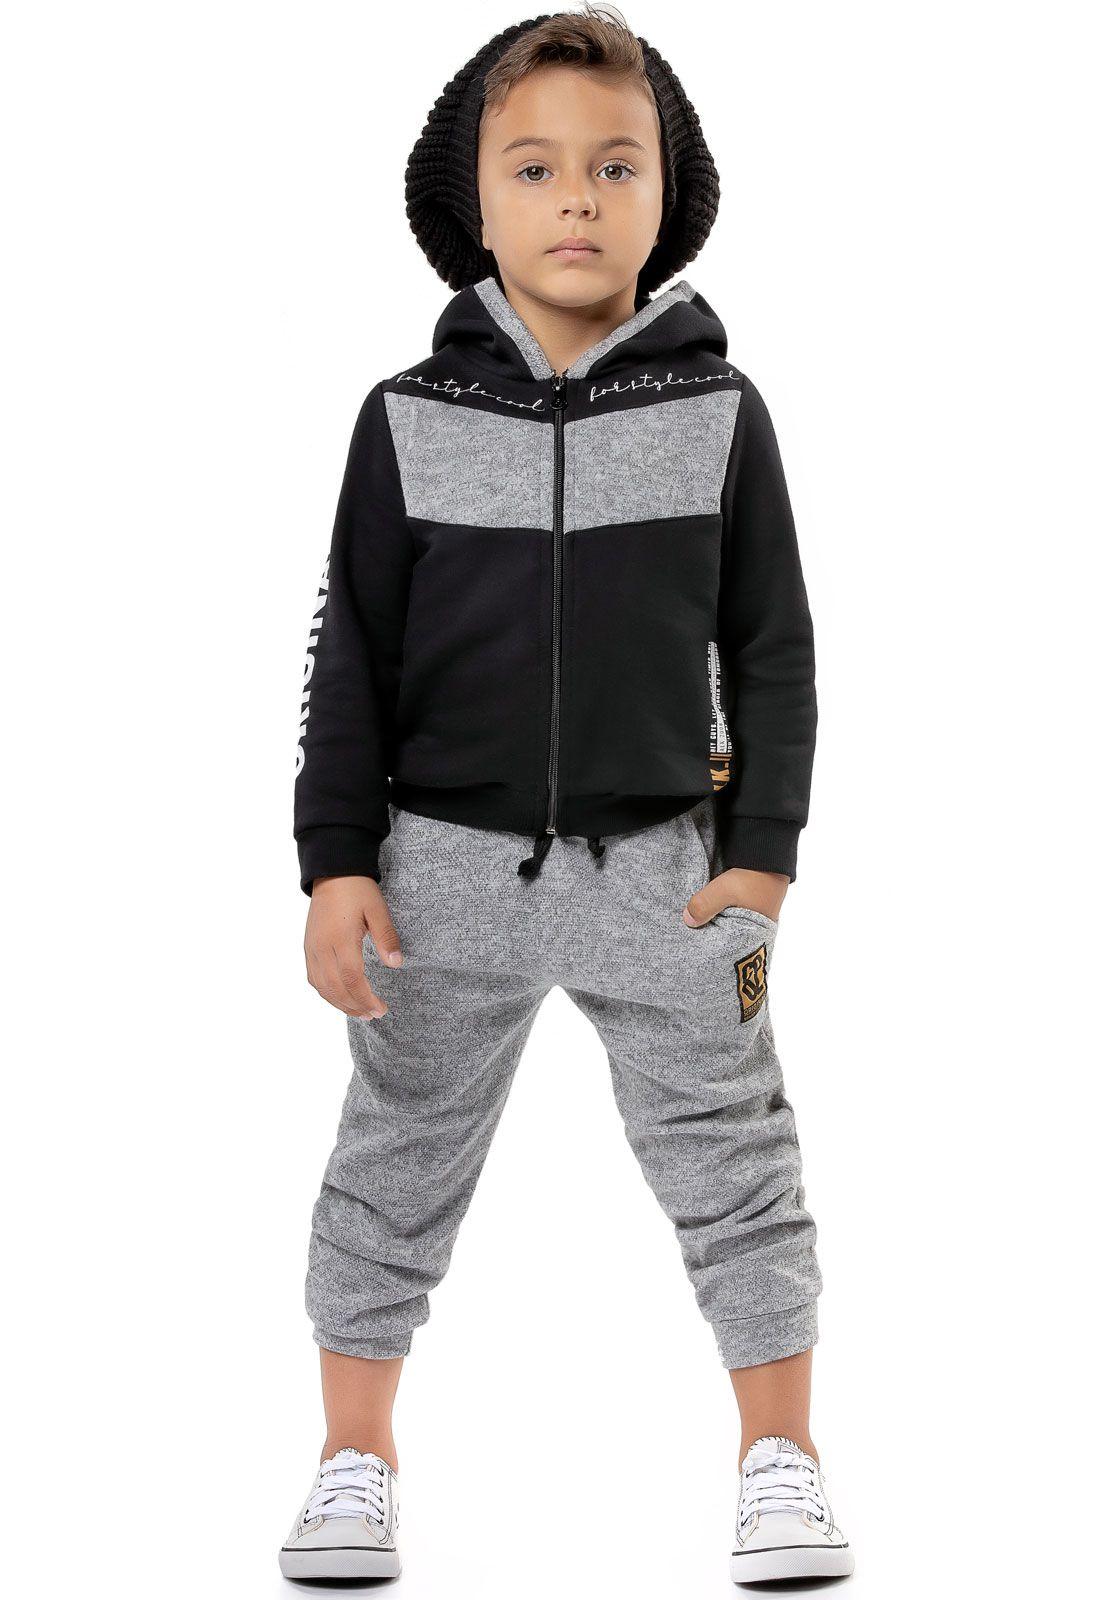 Conjunto Infantil Alekids Style Cool